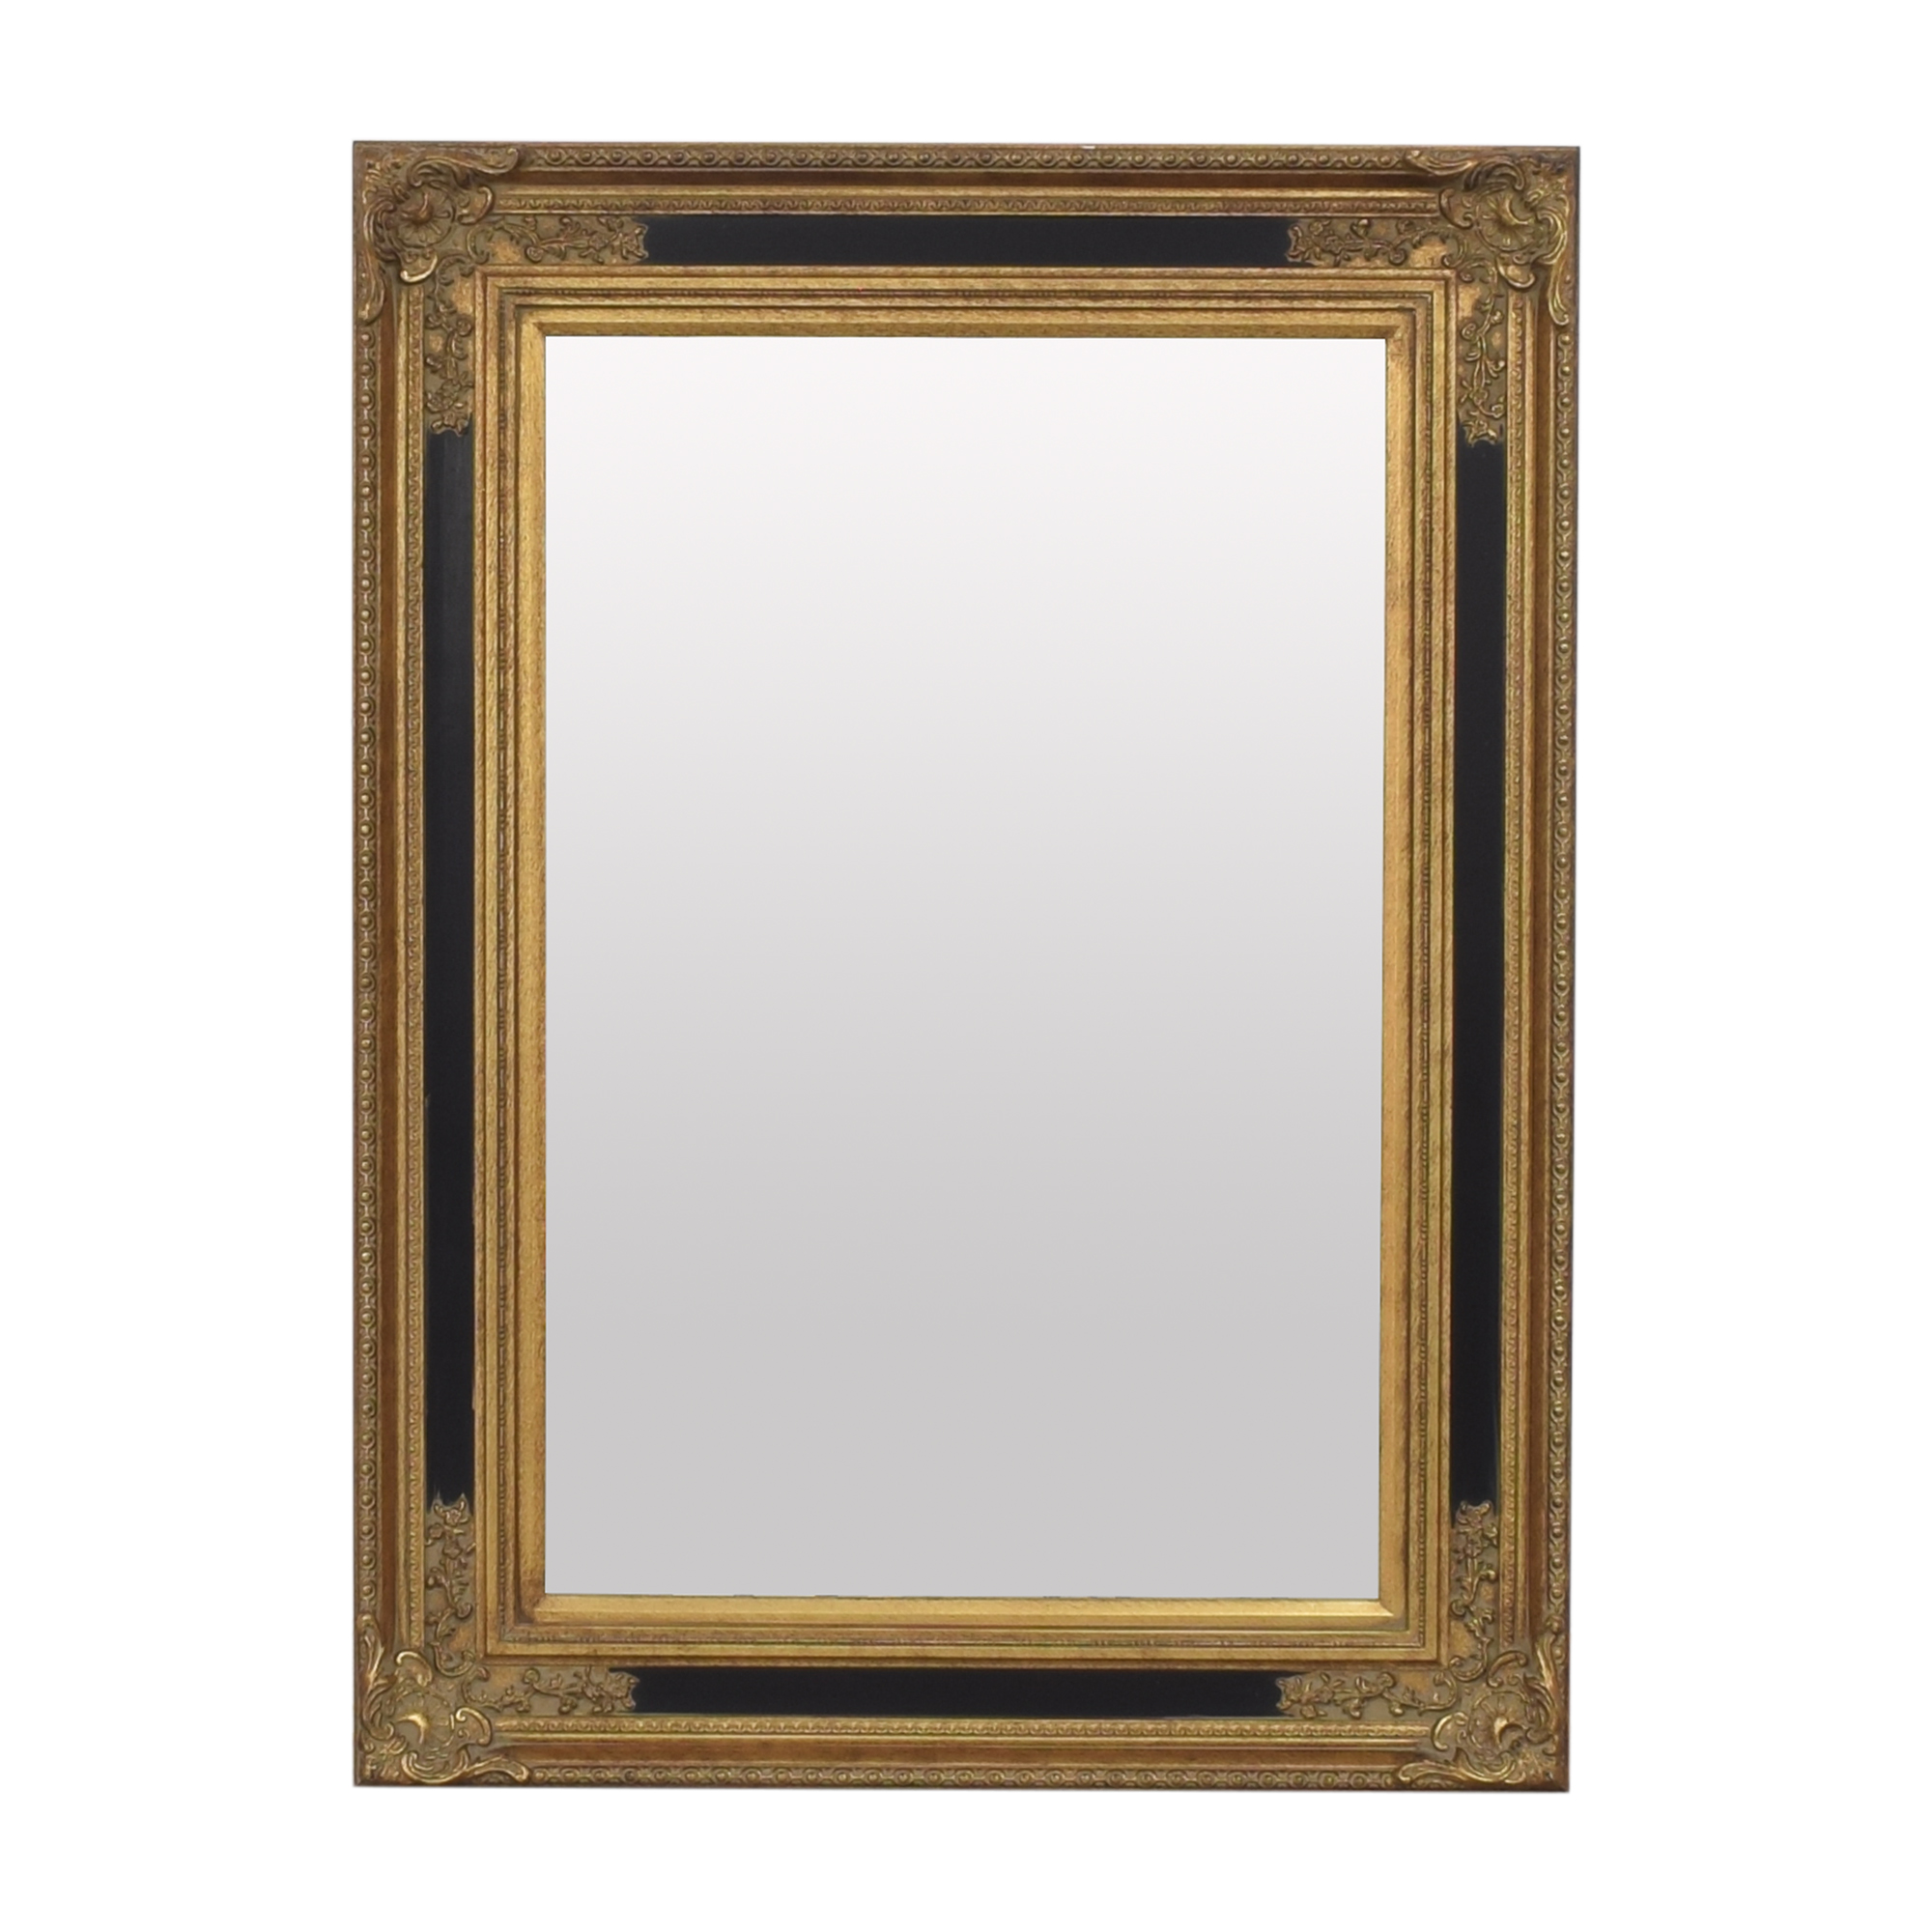 Ornate Framed Wall Mirror sale